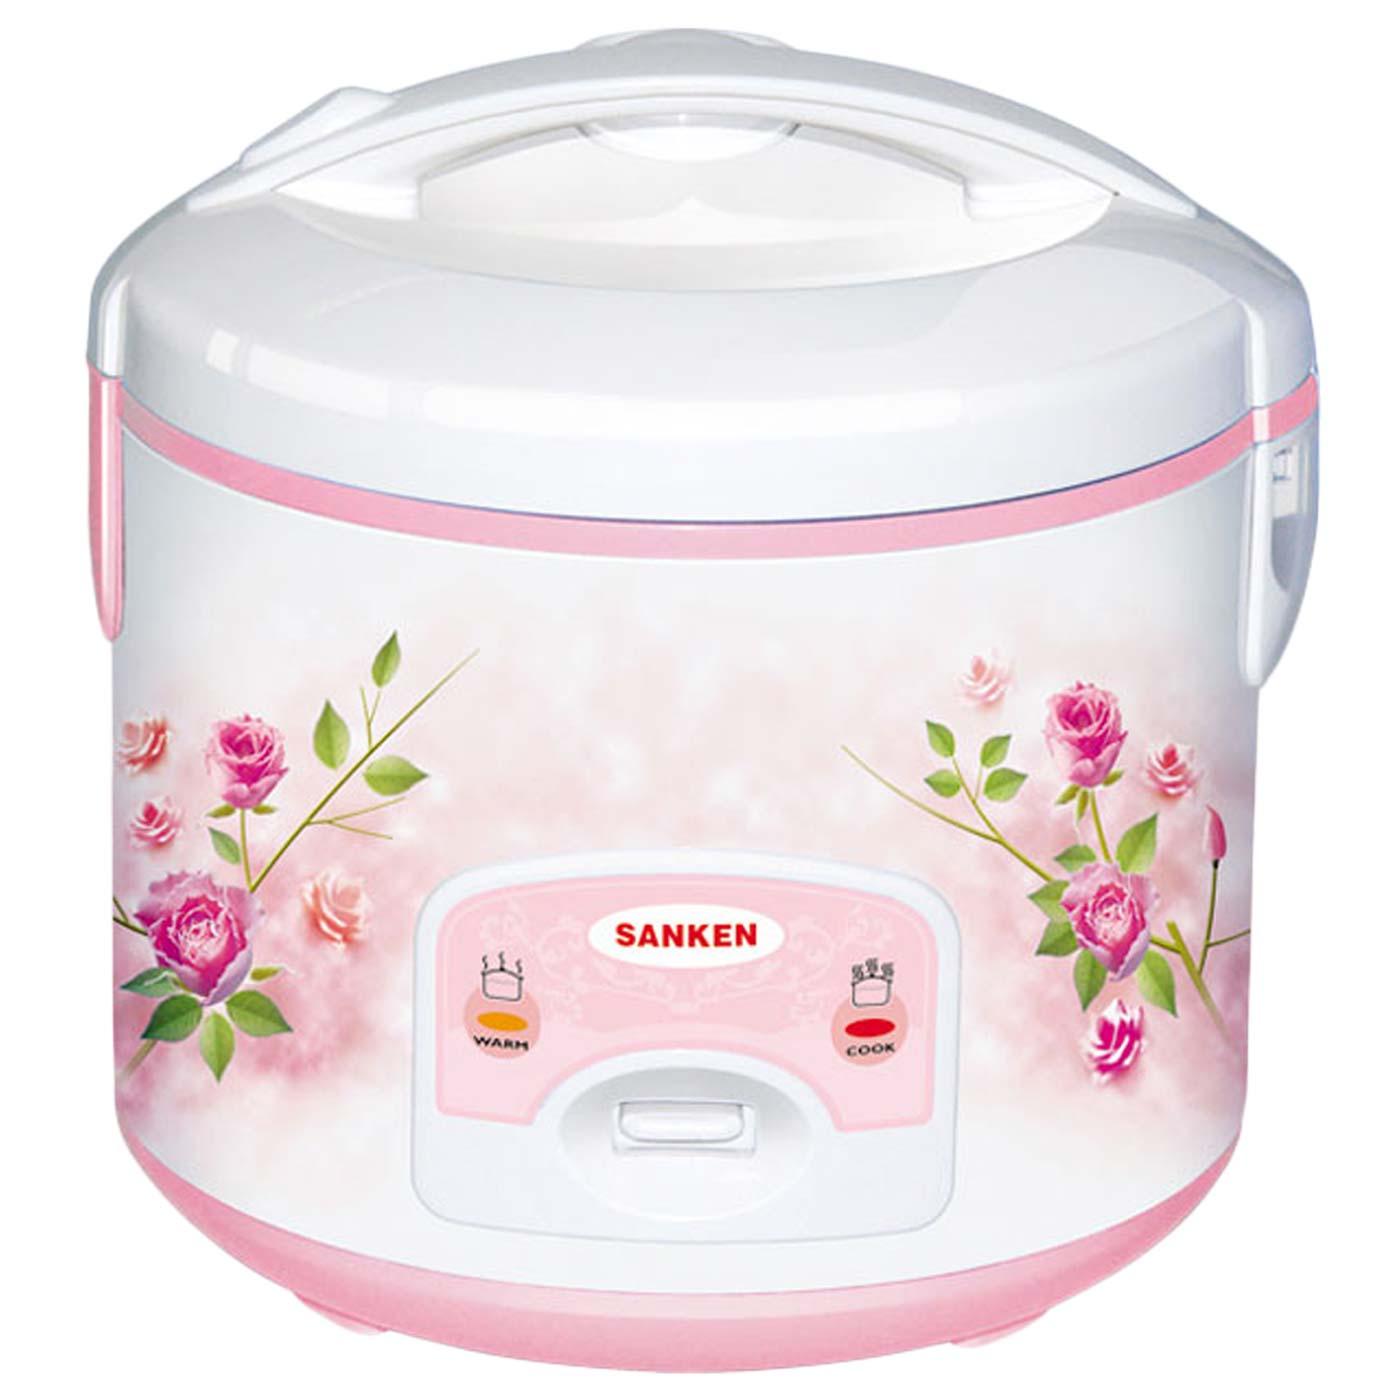 Sanken SJ-638 Ricecooker1.8l (O)